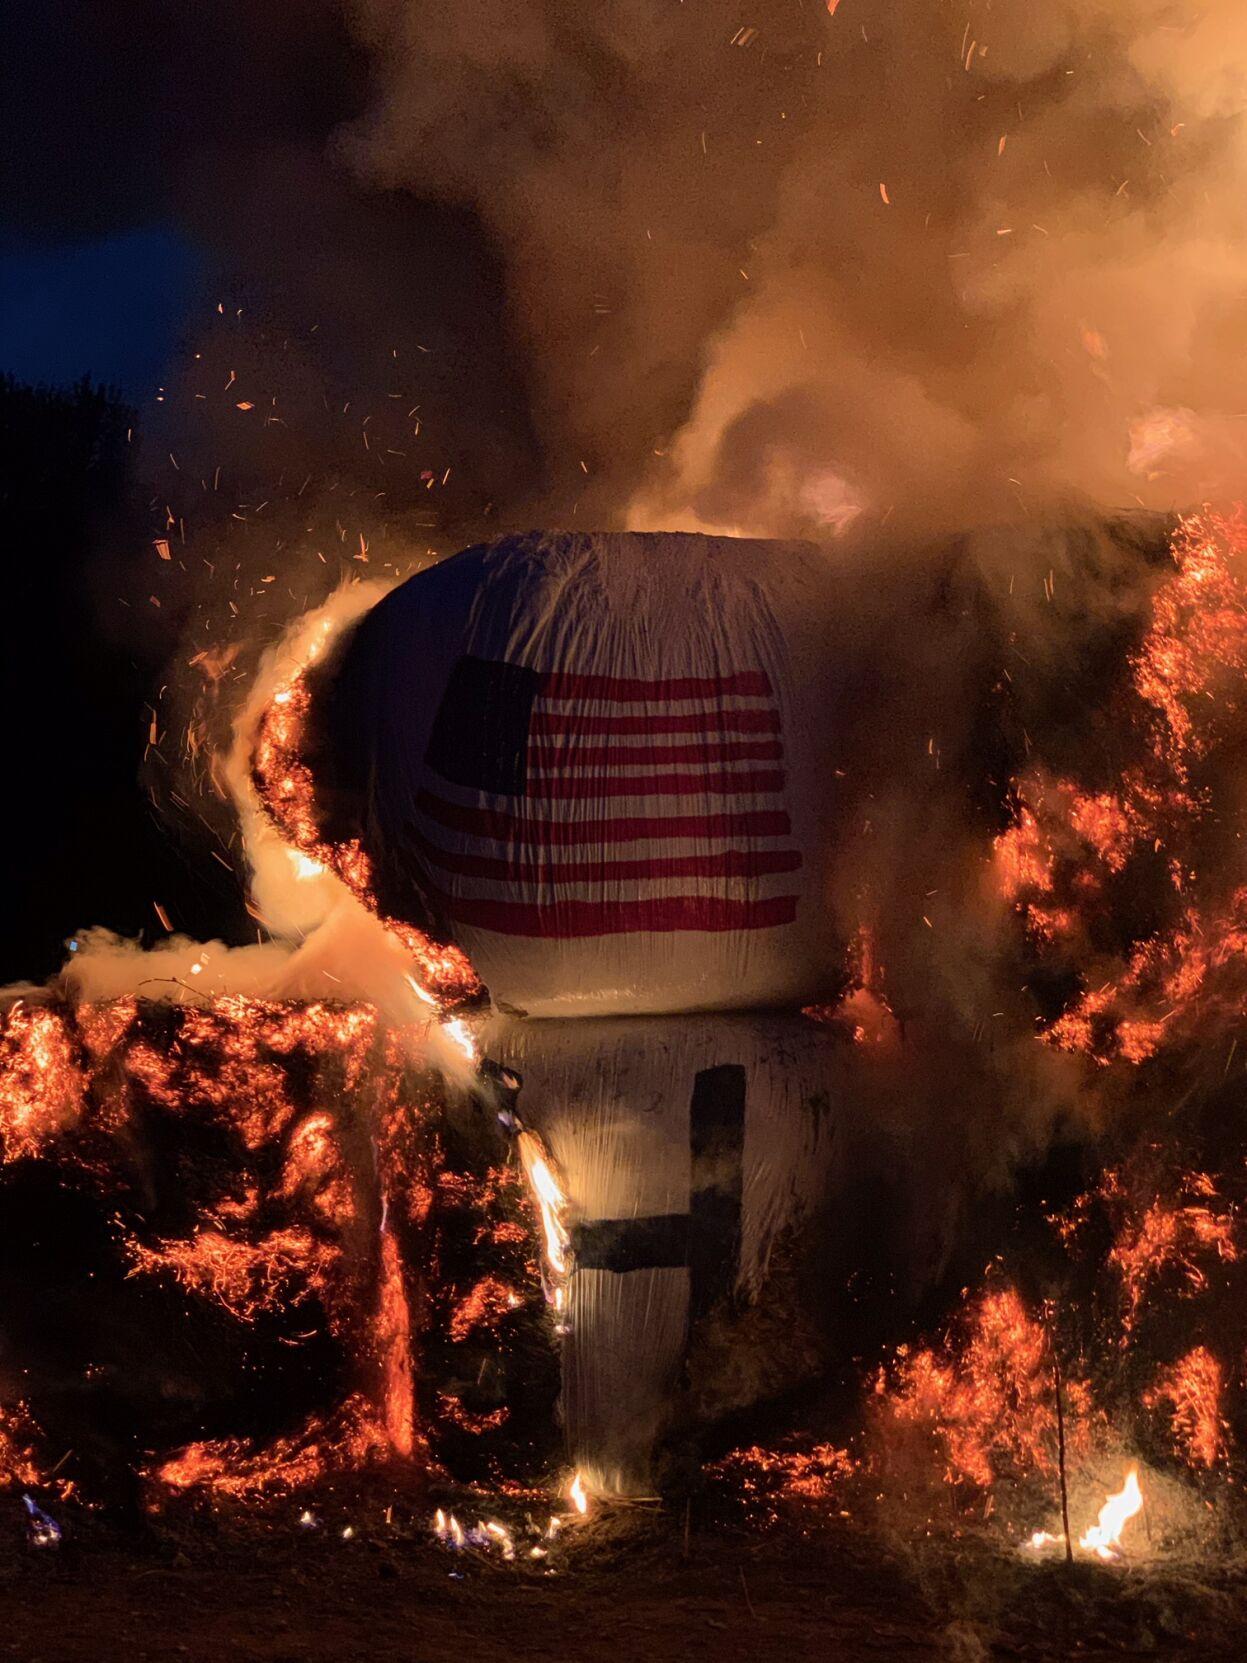 Dalton Farm Fire 4 : DICKEN CRANE.JPG